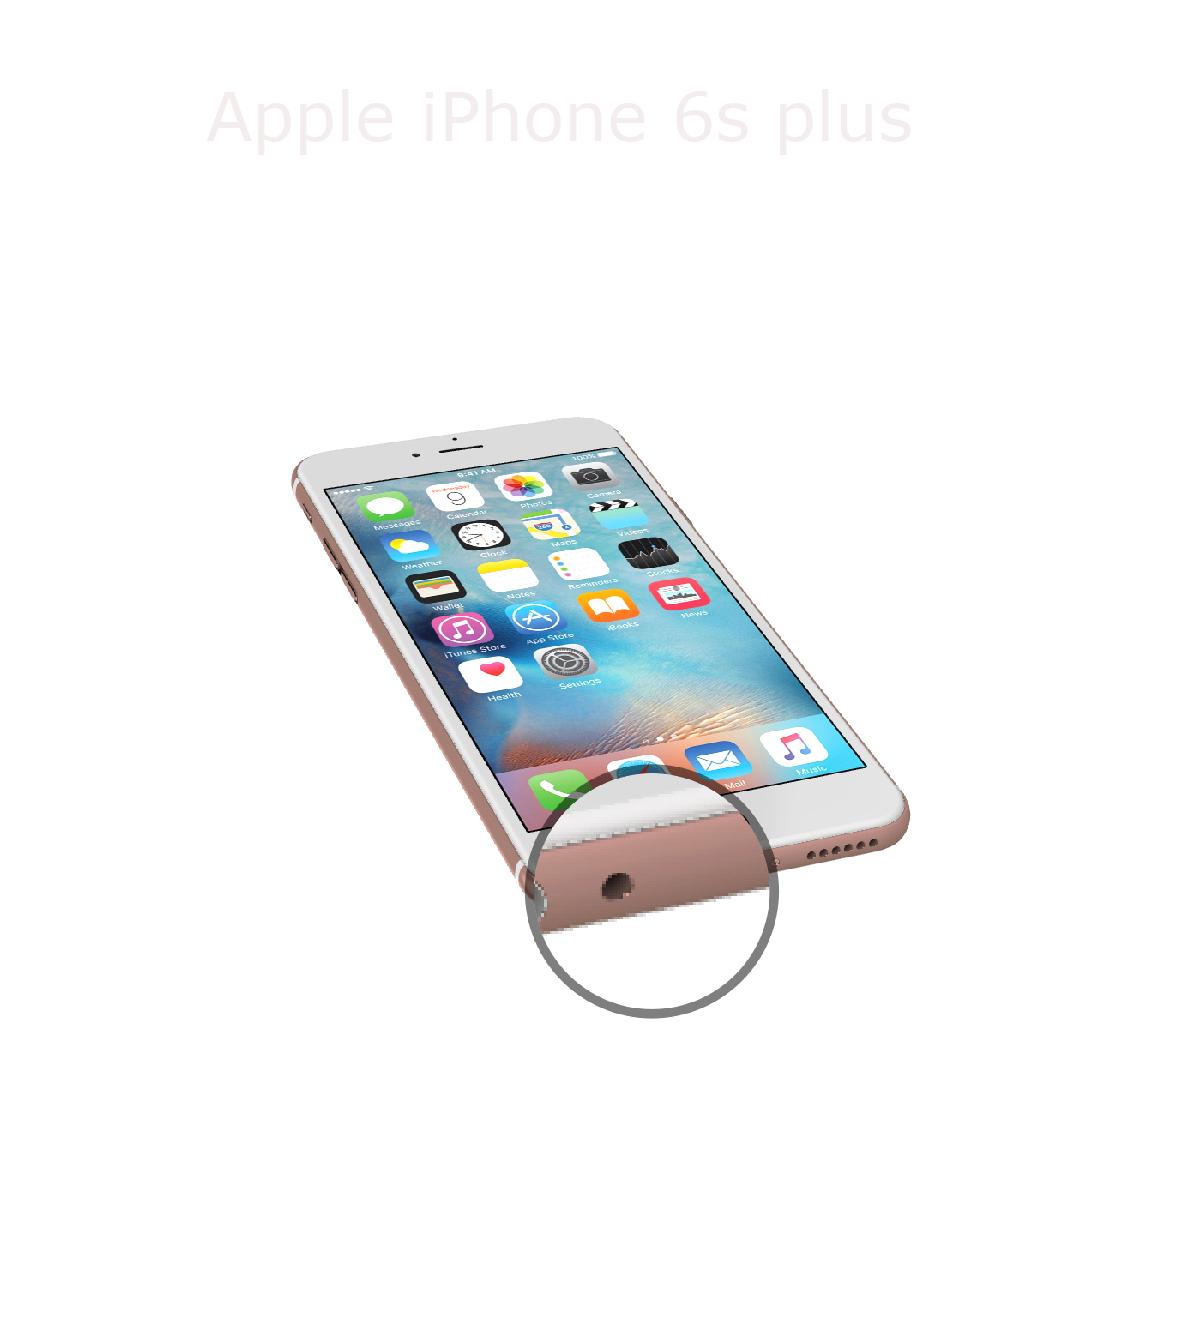 Laga mikrofon iPhone 6s plus